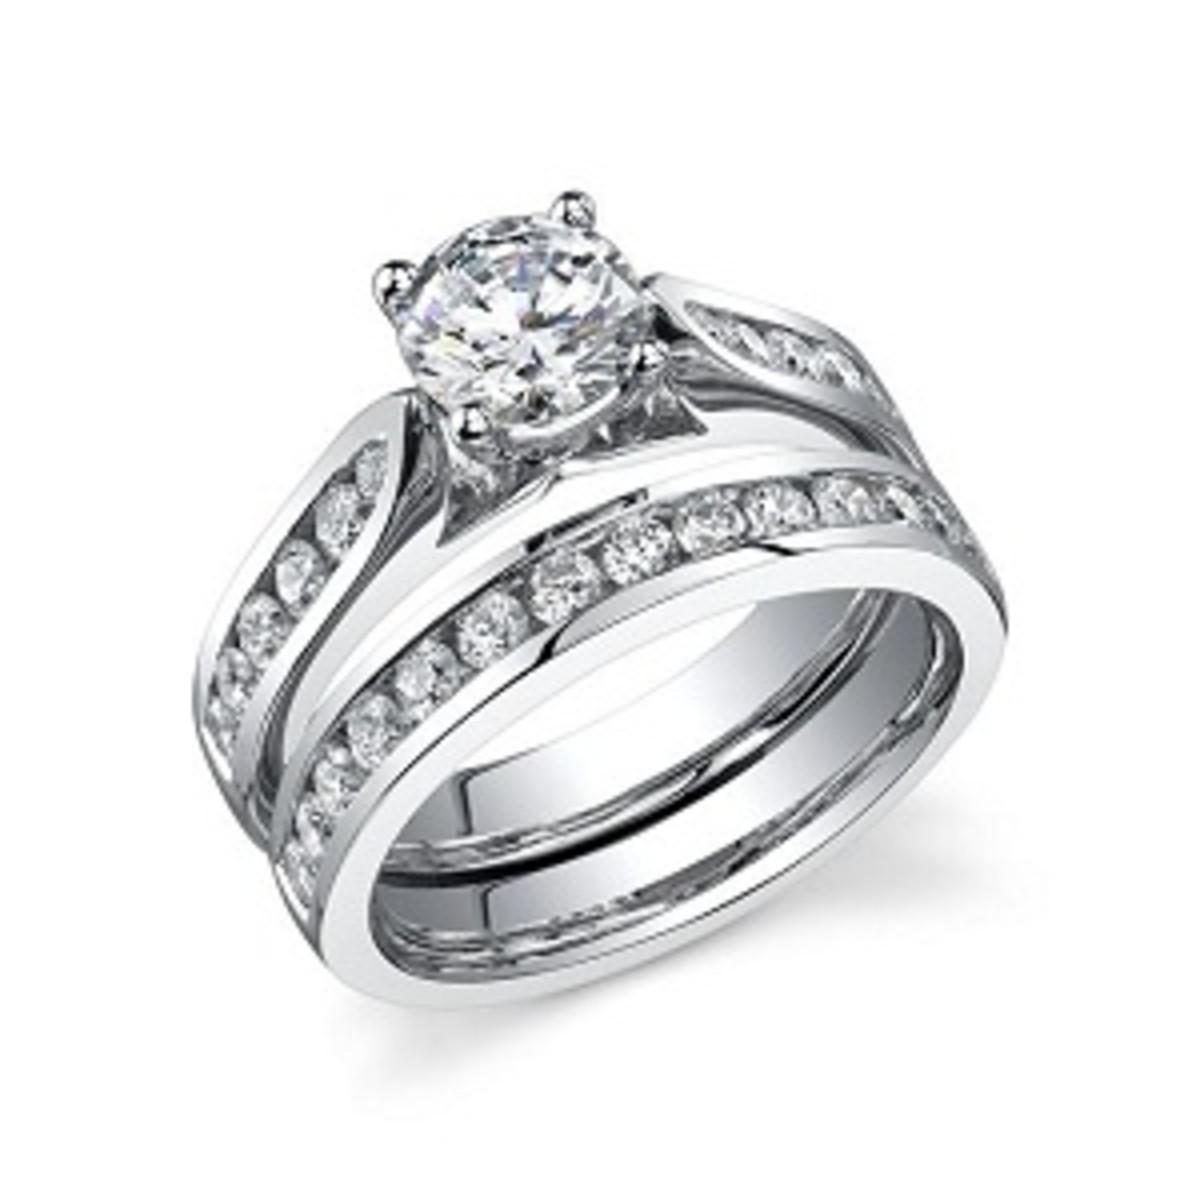 Round Cut Diamond Ring set